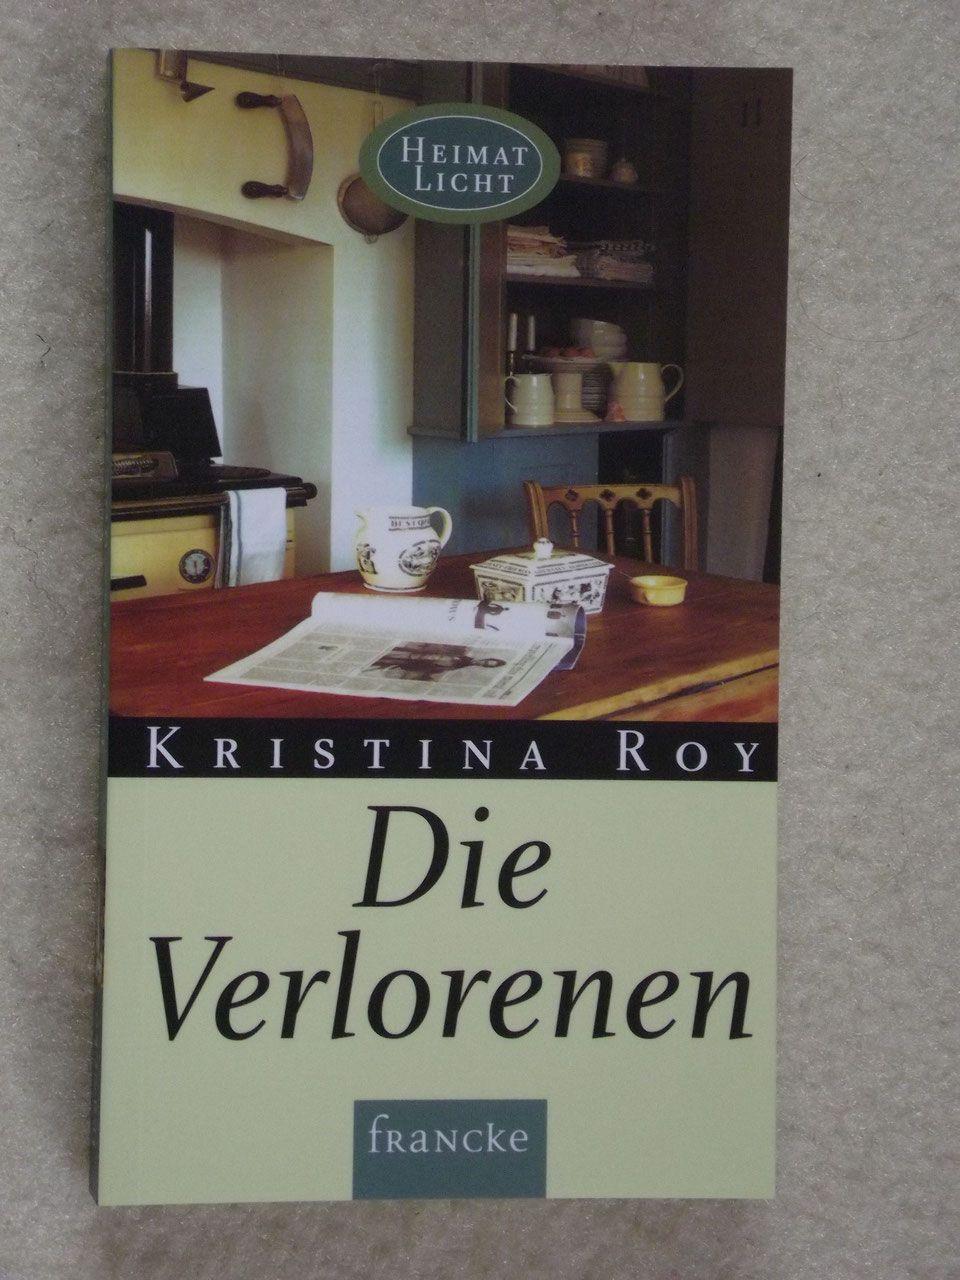 Taschenbuch-Paper Back 2 - ingolflenski-shops, beletristik, australien romane…